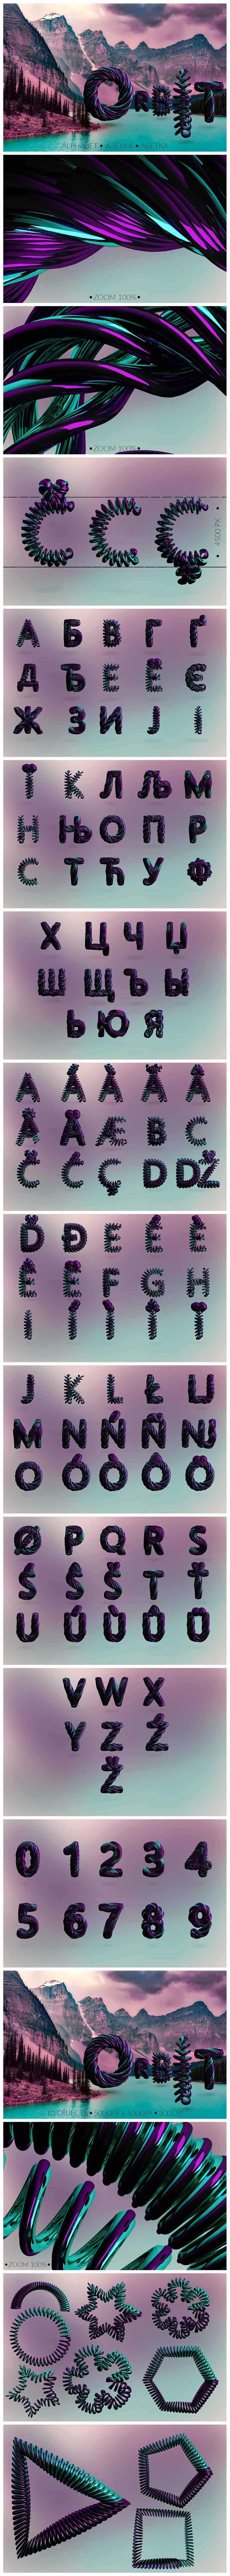 Huge Graphic Bundle Alphabet with 1000+ elements - $25 - Orbit min